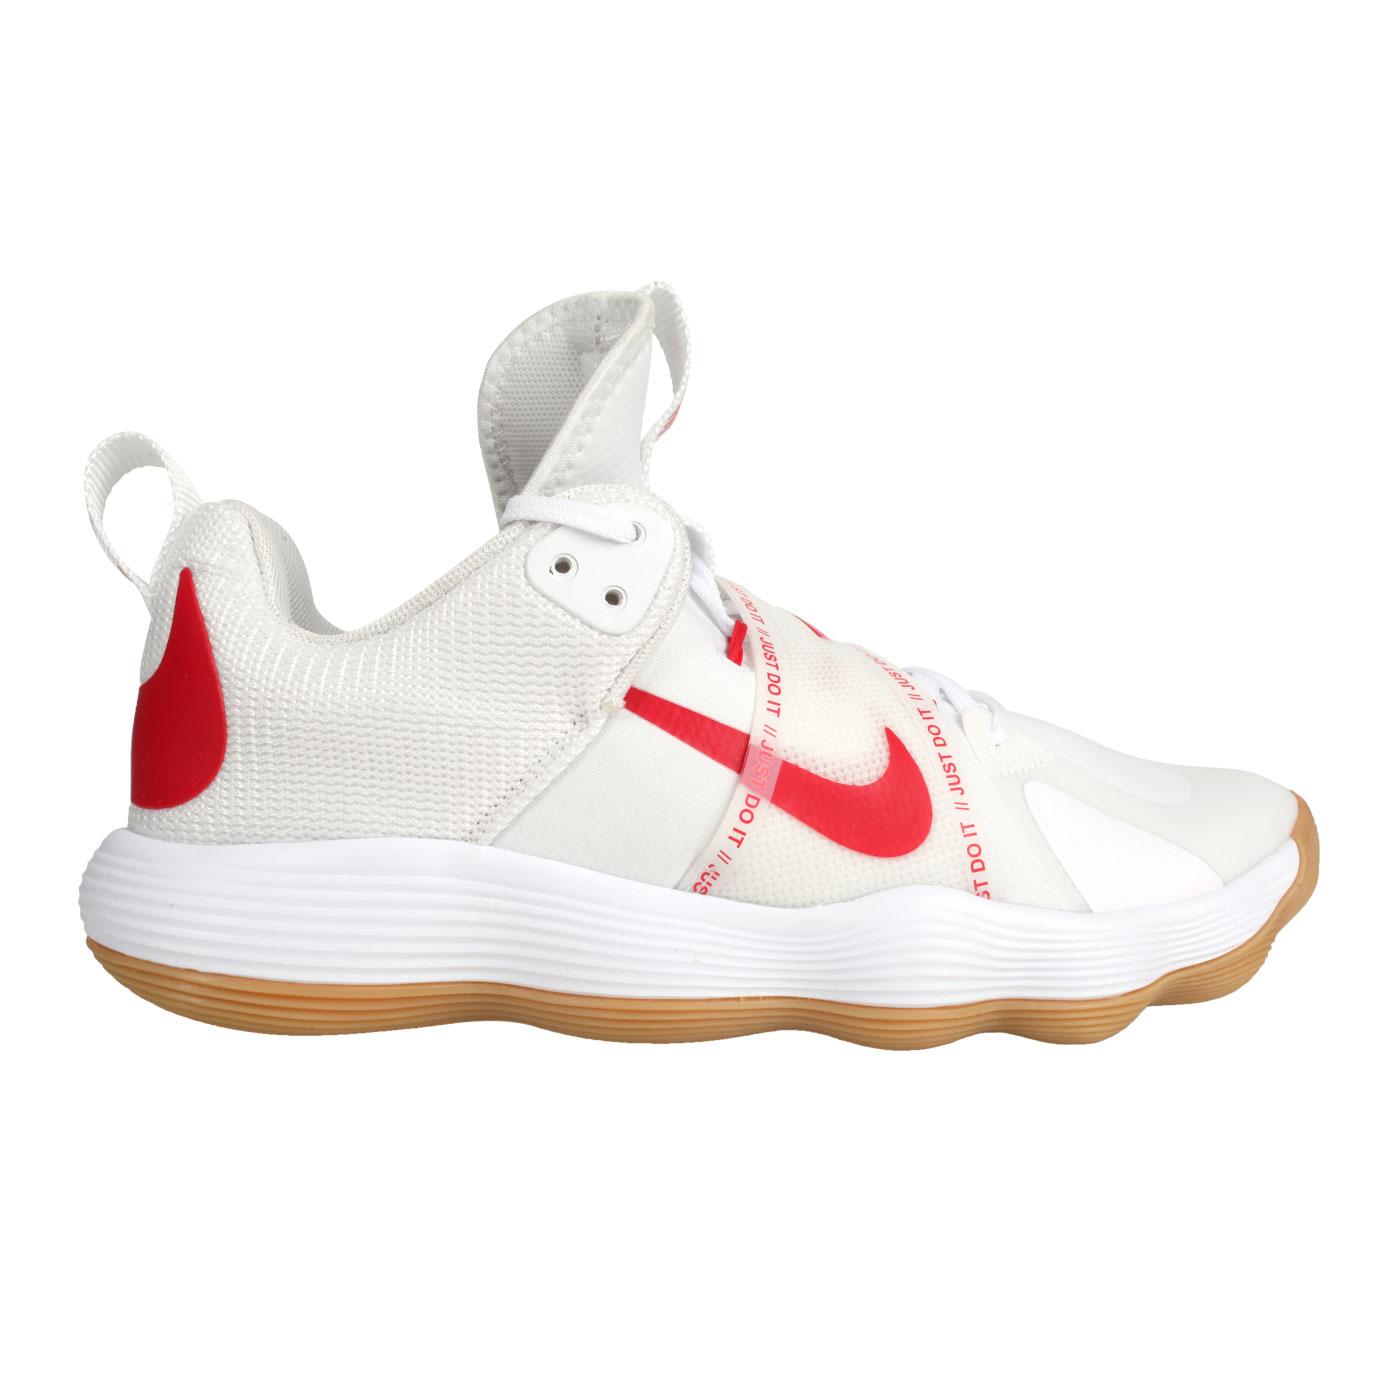 NIKE 男款排球室內運動鞋  @REACT HYPERSET@CI2955140 - 白紅